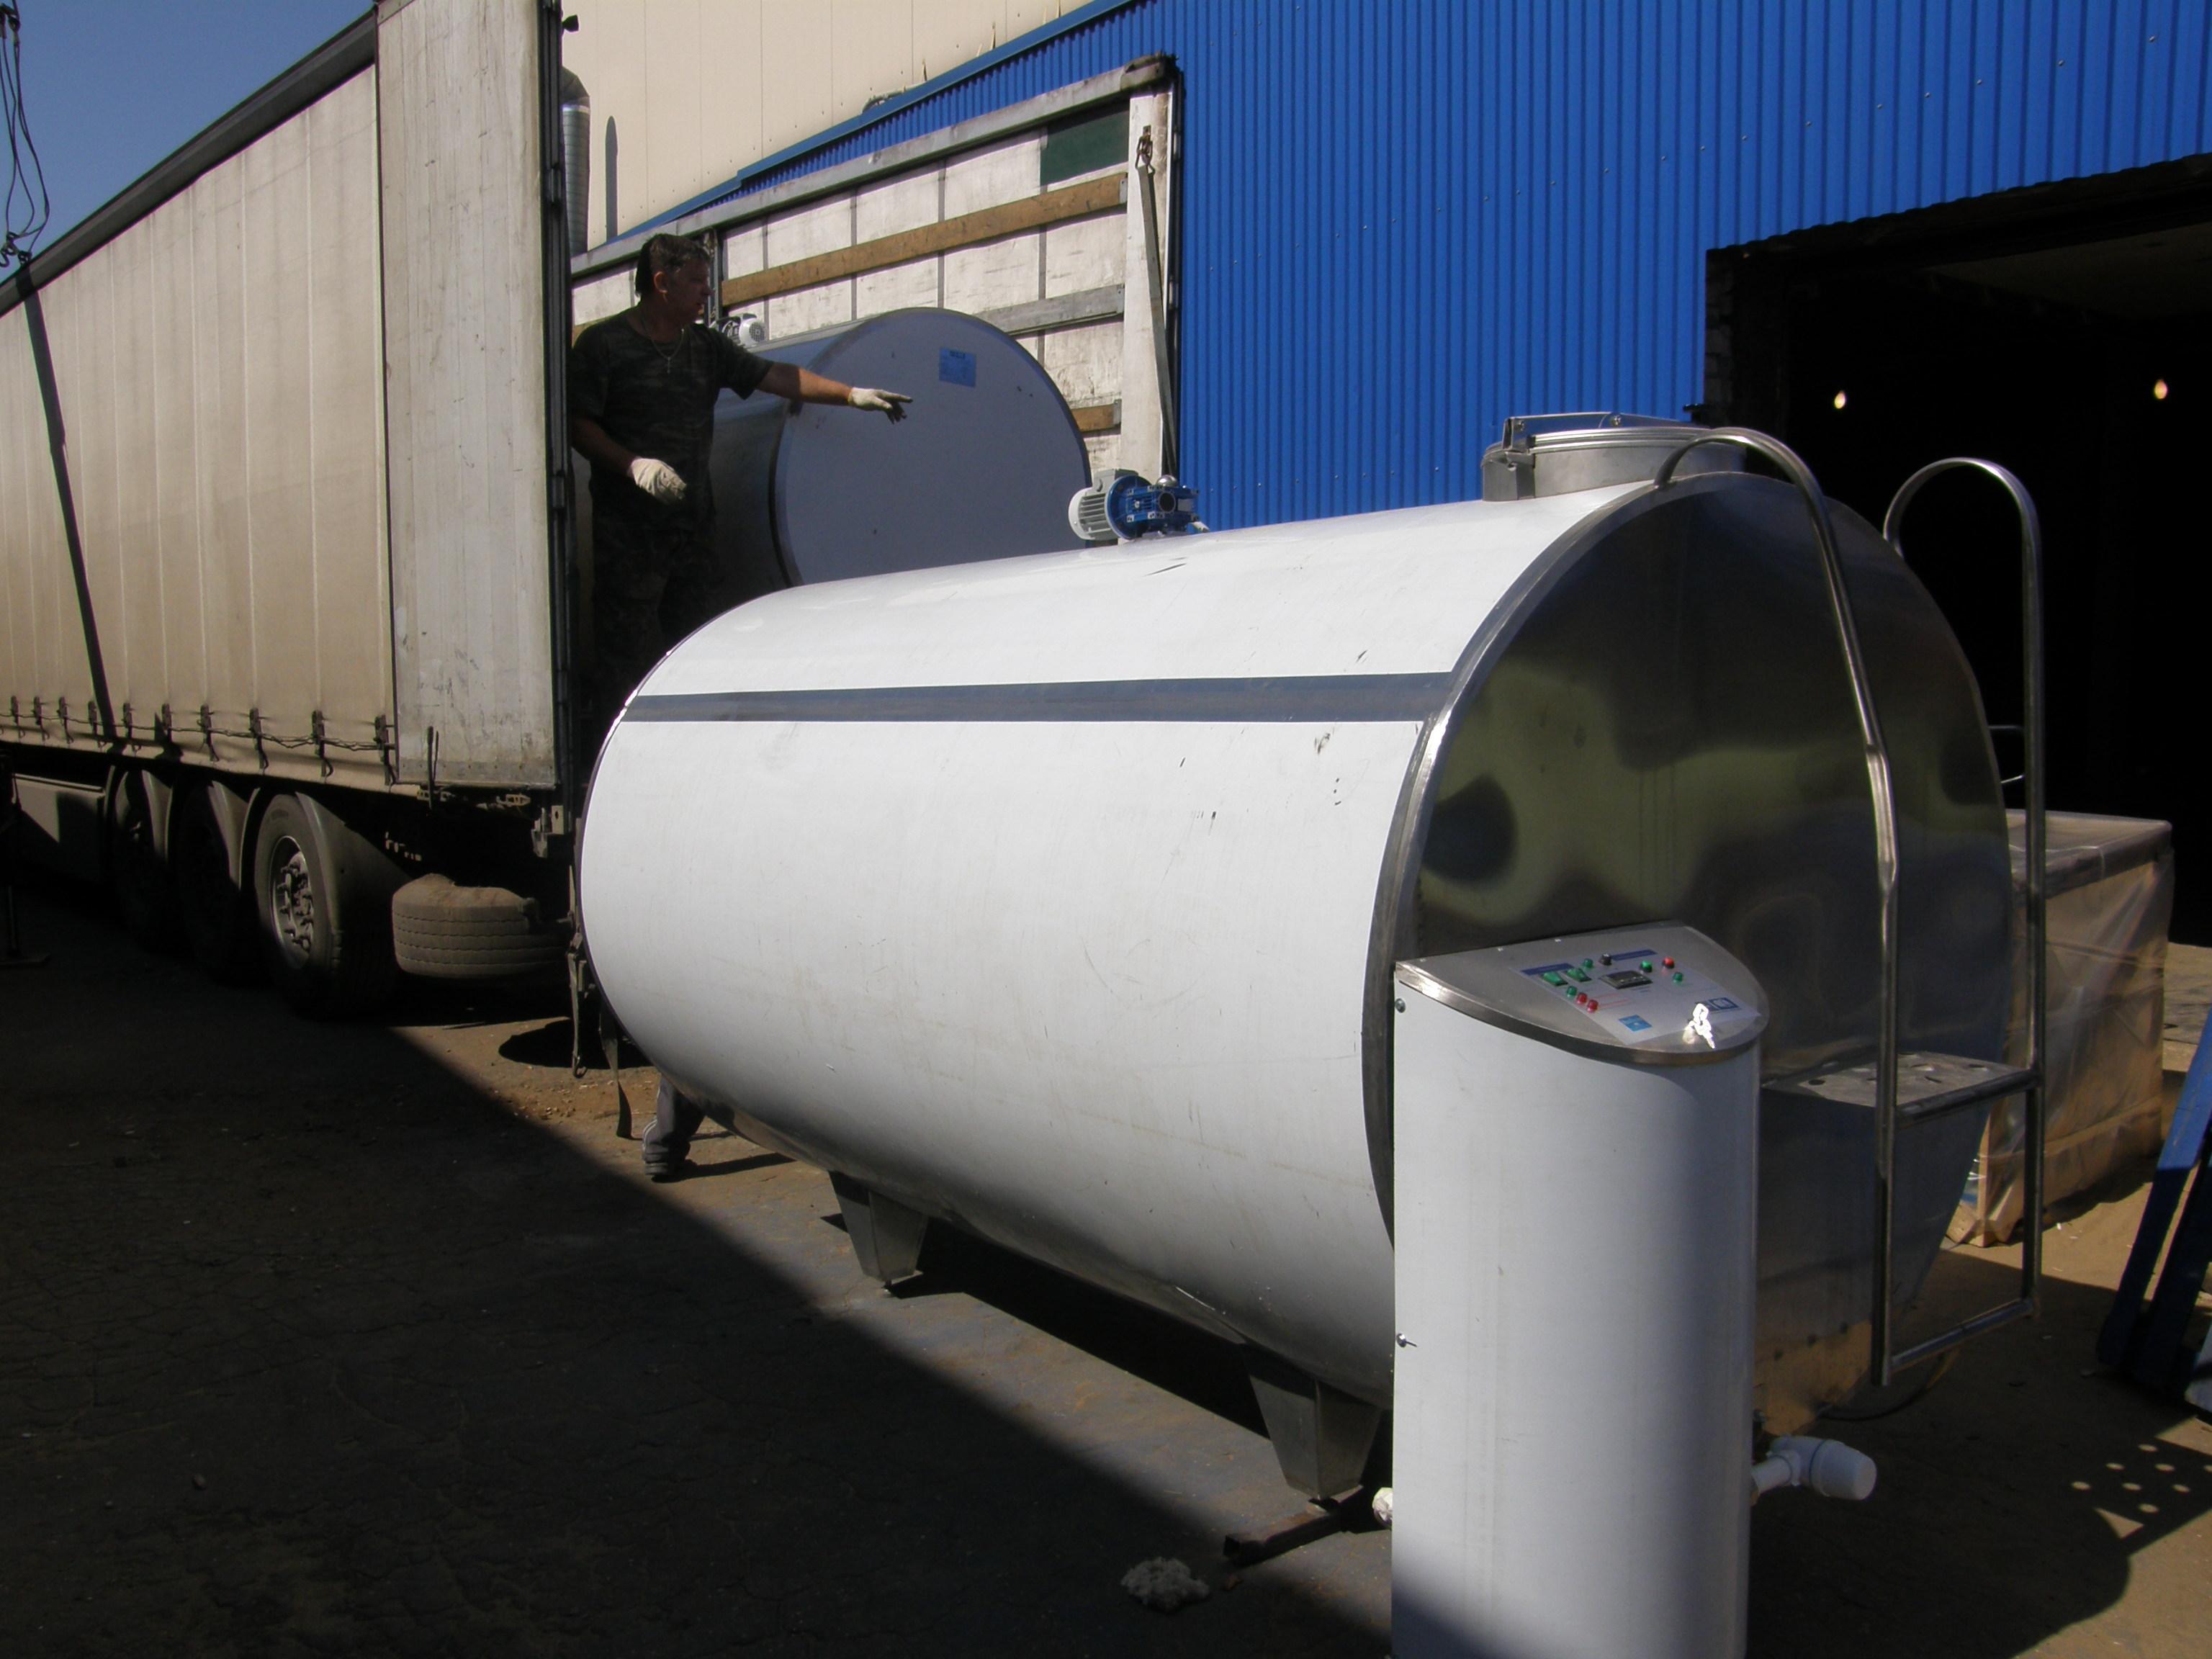 ВТатарстане стартует программа поставки танков-охладителей молока